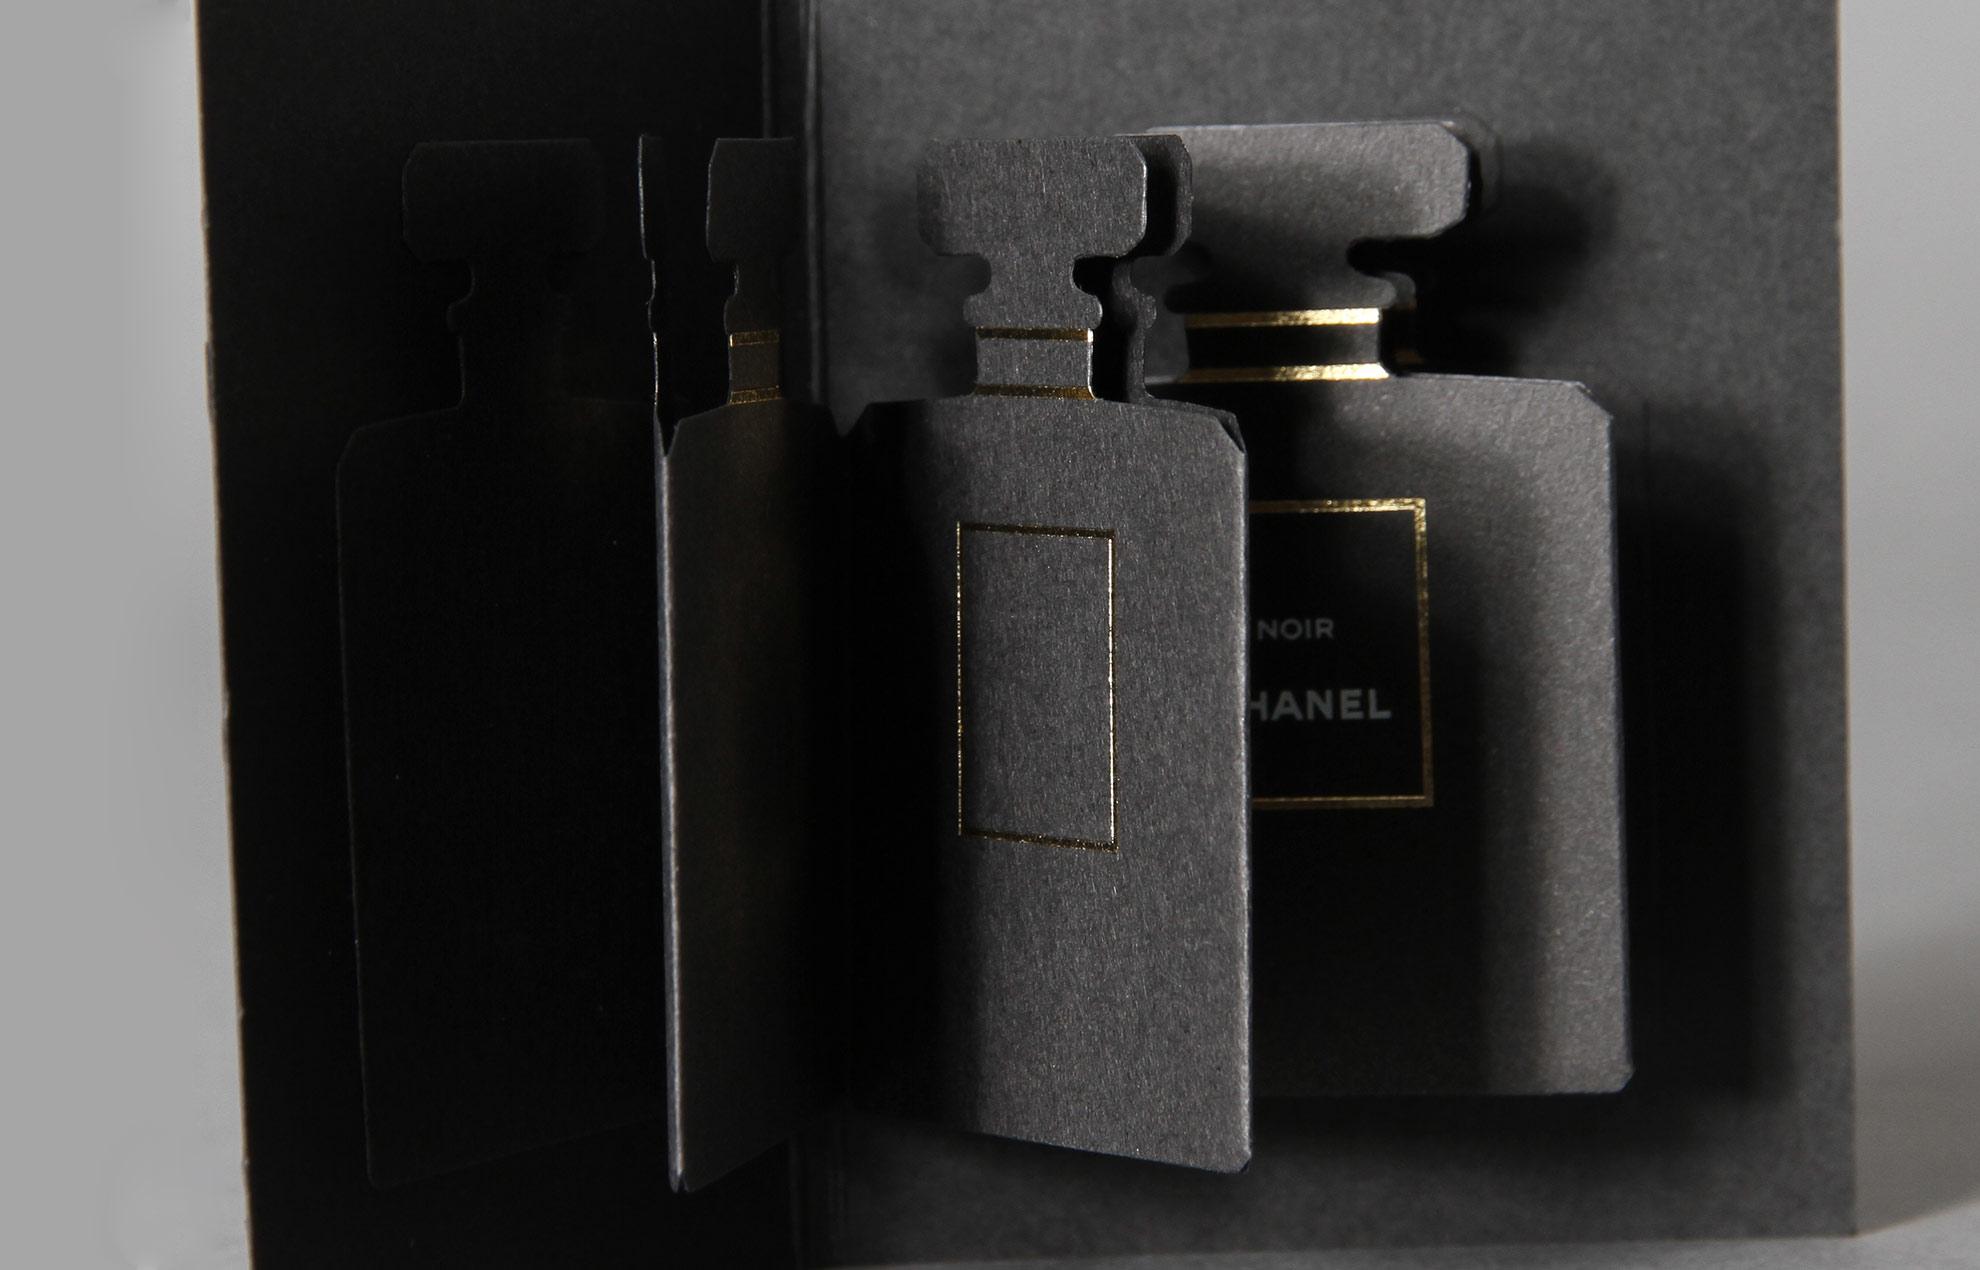 chanel coco noir hot stamping blotter paper object. Black Bedroom Furniture Sets. Home Design Ideas